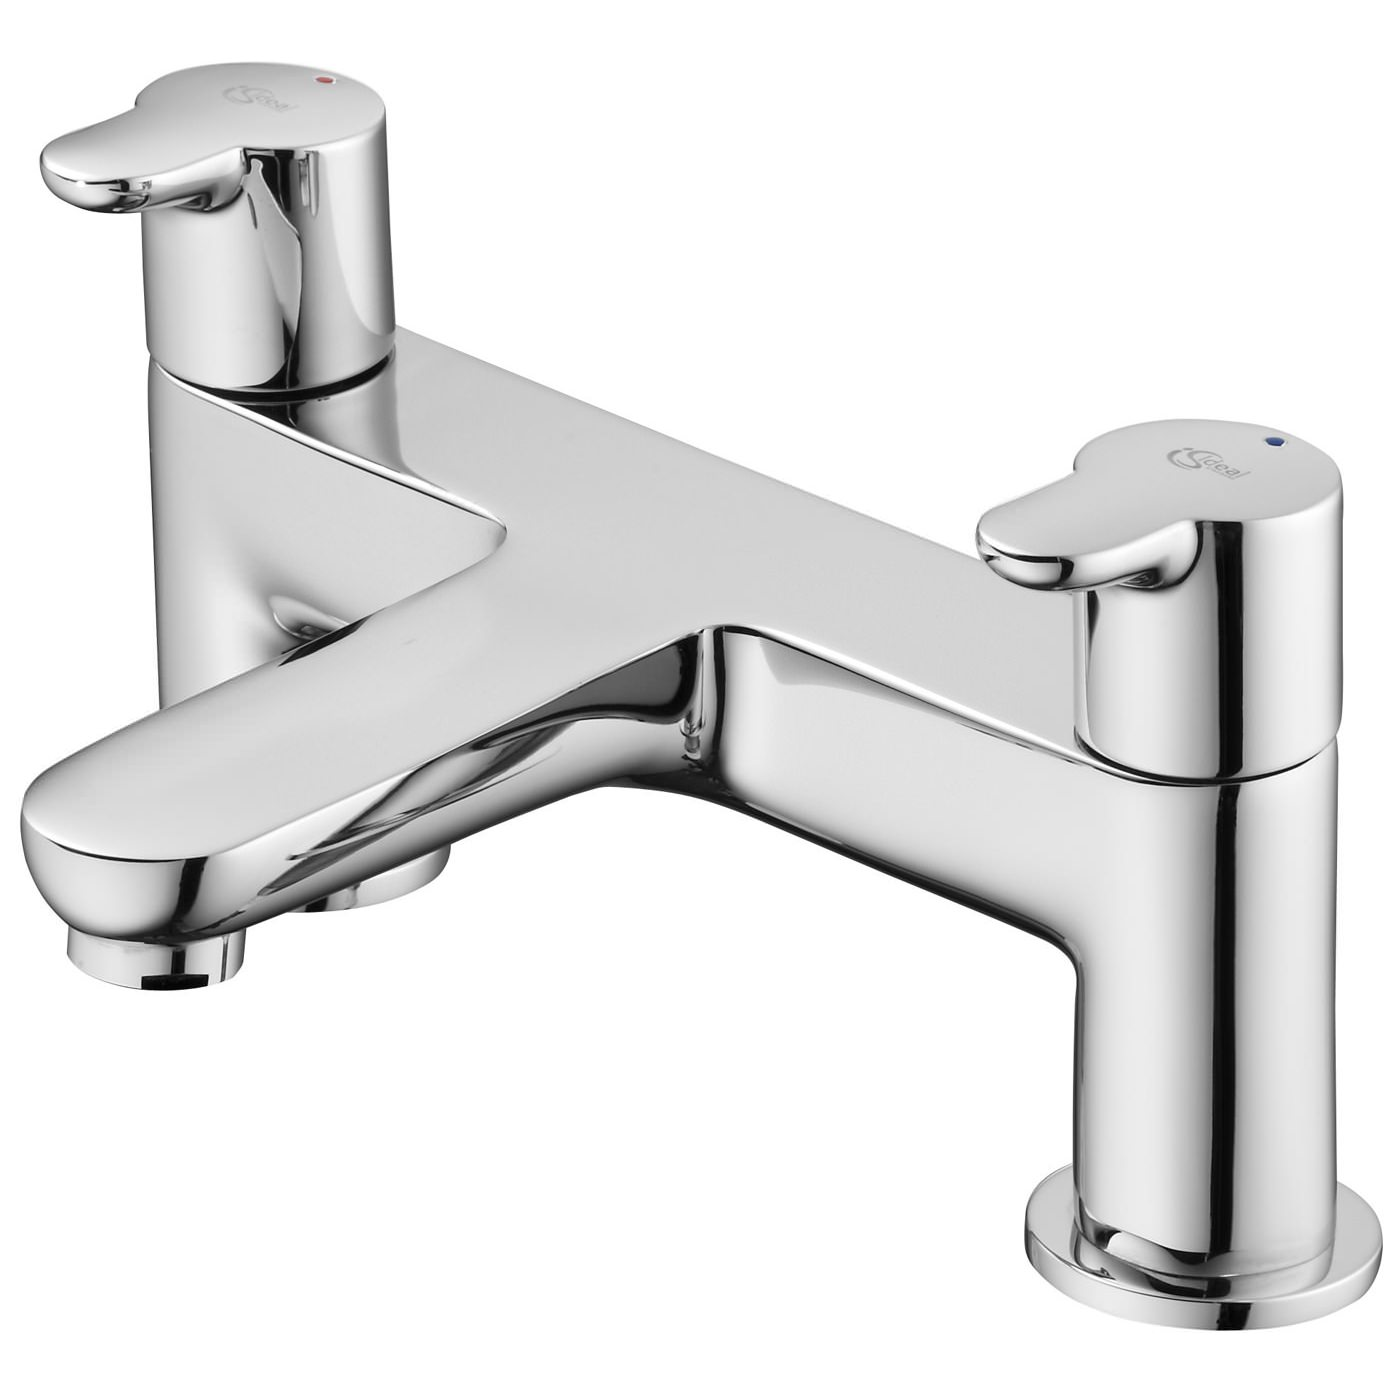 Ideal Standard Concept Blue 2 Hole Bath Filler Tap